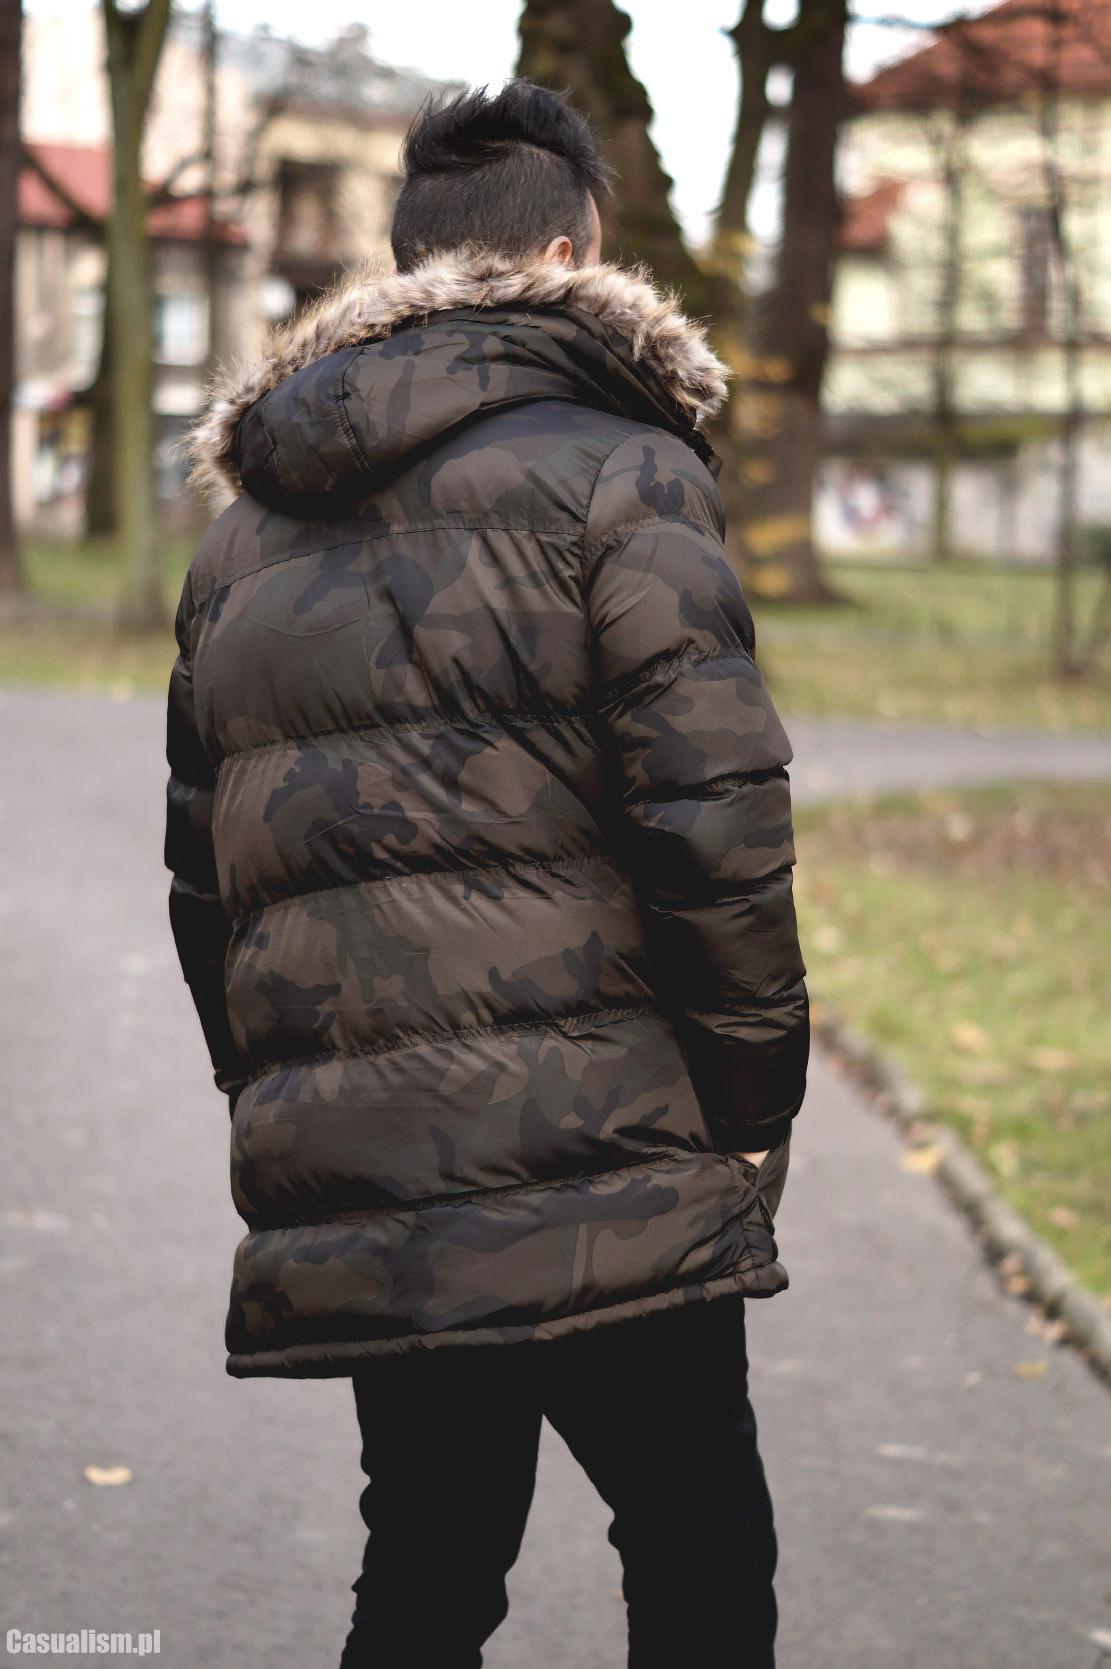 Męska parka camo, parka męska, męska parka, parka dla faceta, zimowa parka, parka na zimę, płaszcz zimowy, płaszcz na zimę męski, męskie płaszcze zimowe, puchowa kurtka